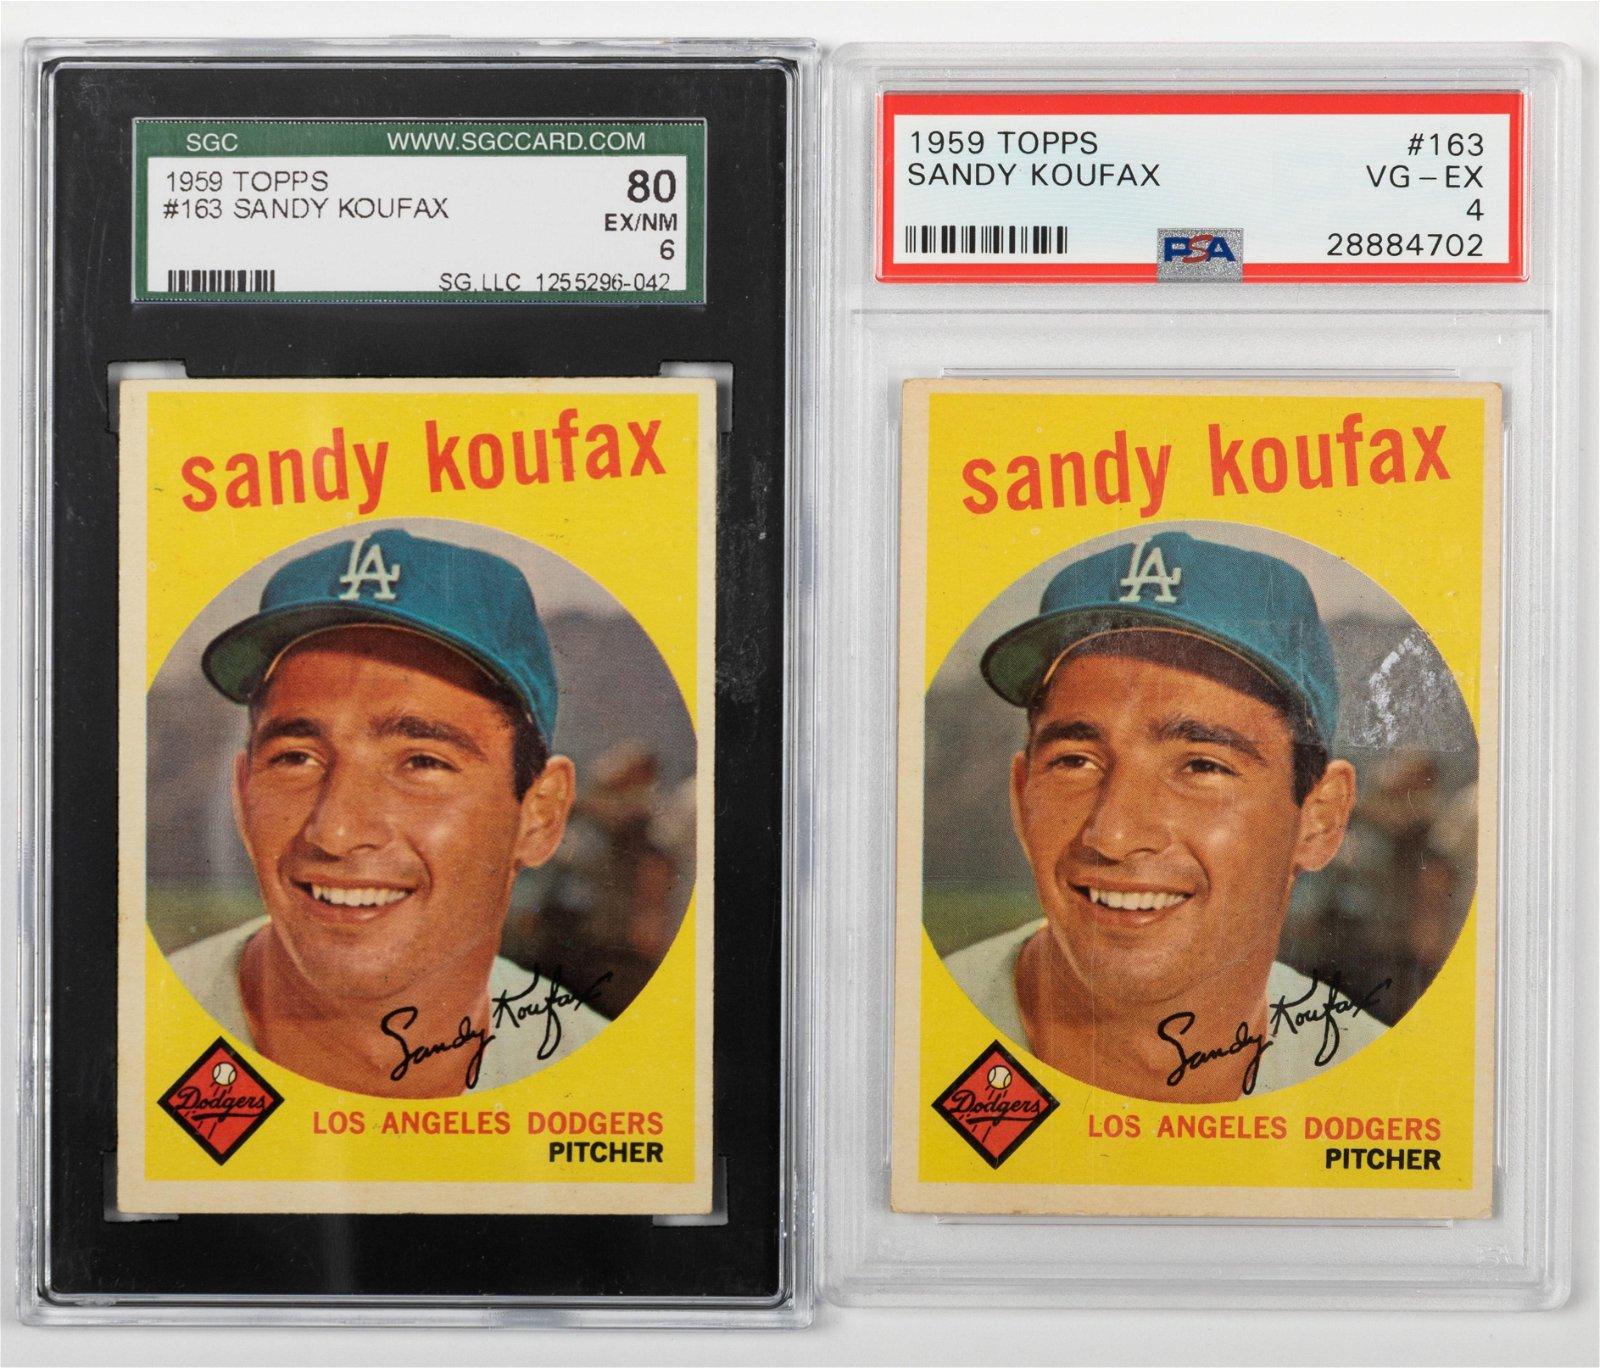 Topps - 1959 Sandy Koufax Baseball Cards - 2